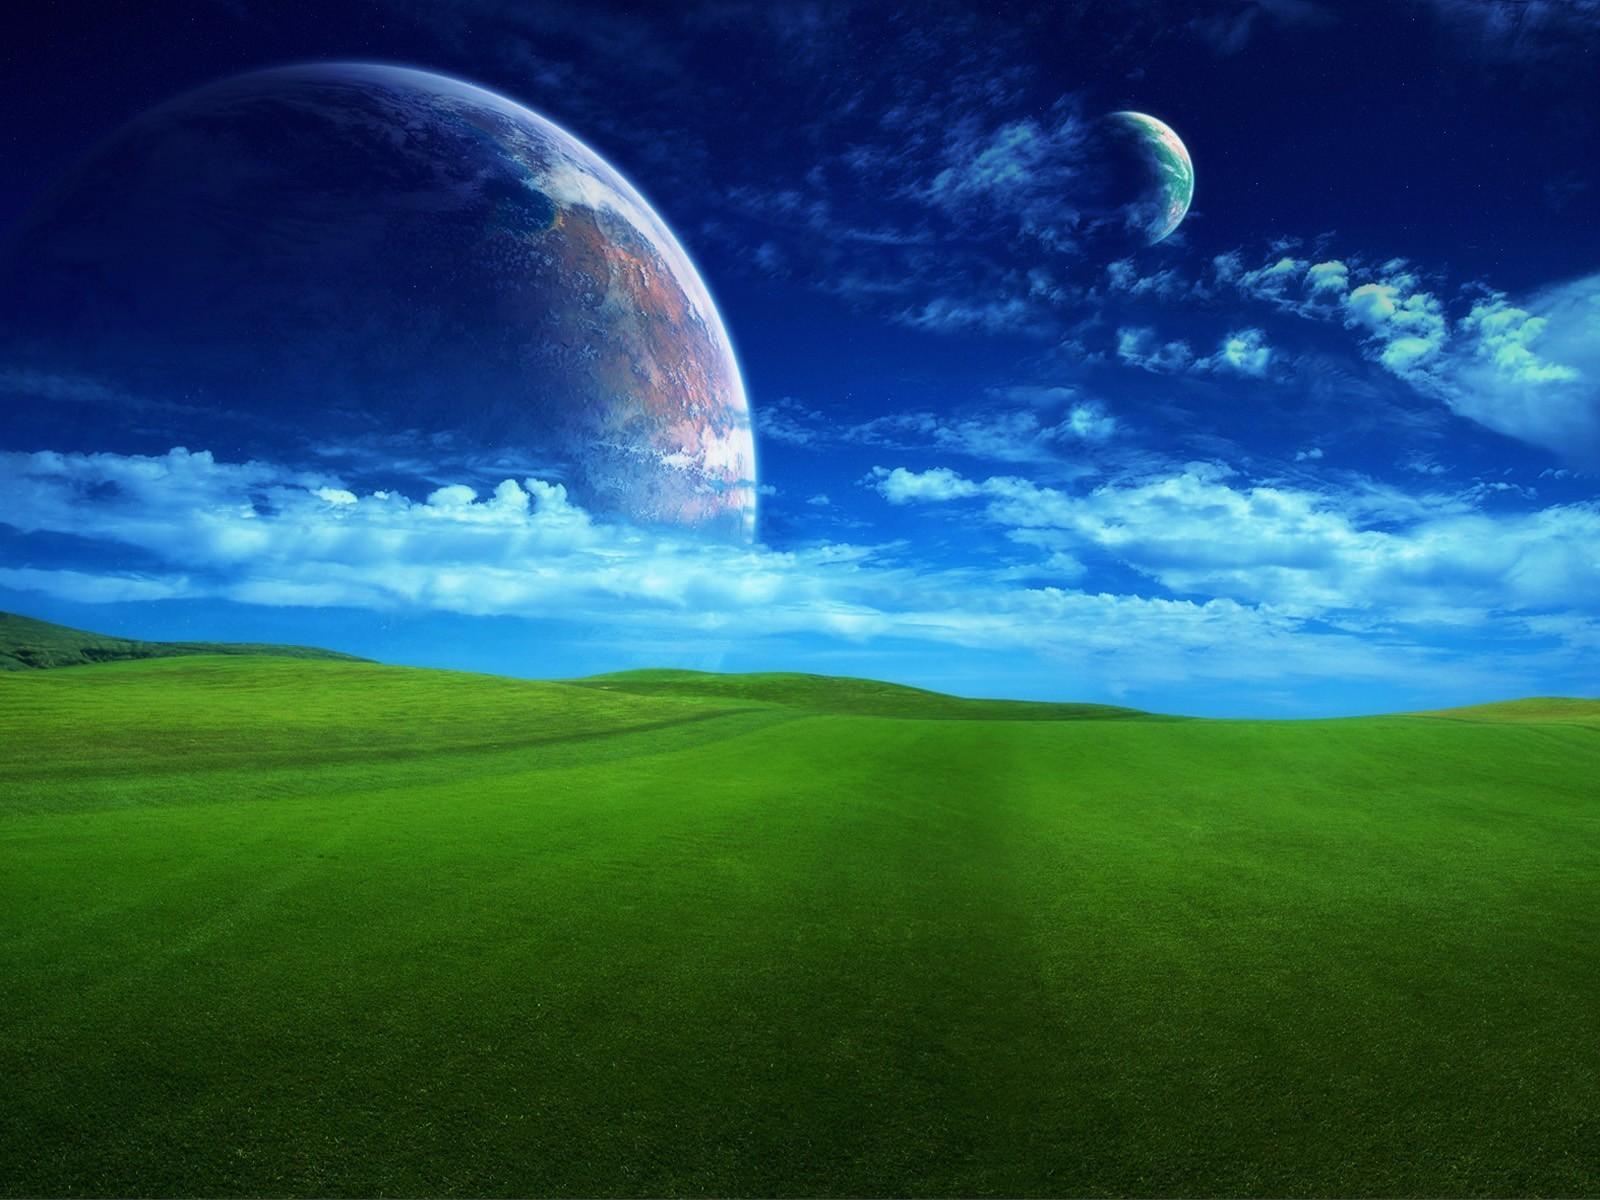 windows moon wallpaper, скачать фото, луна днем, зеленая поляка и синее небо